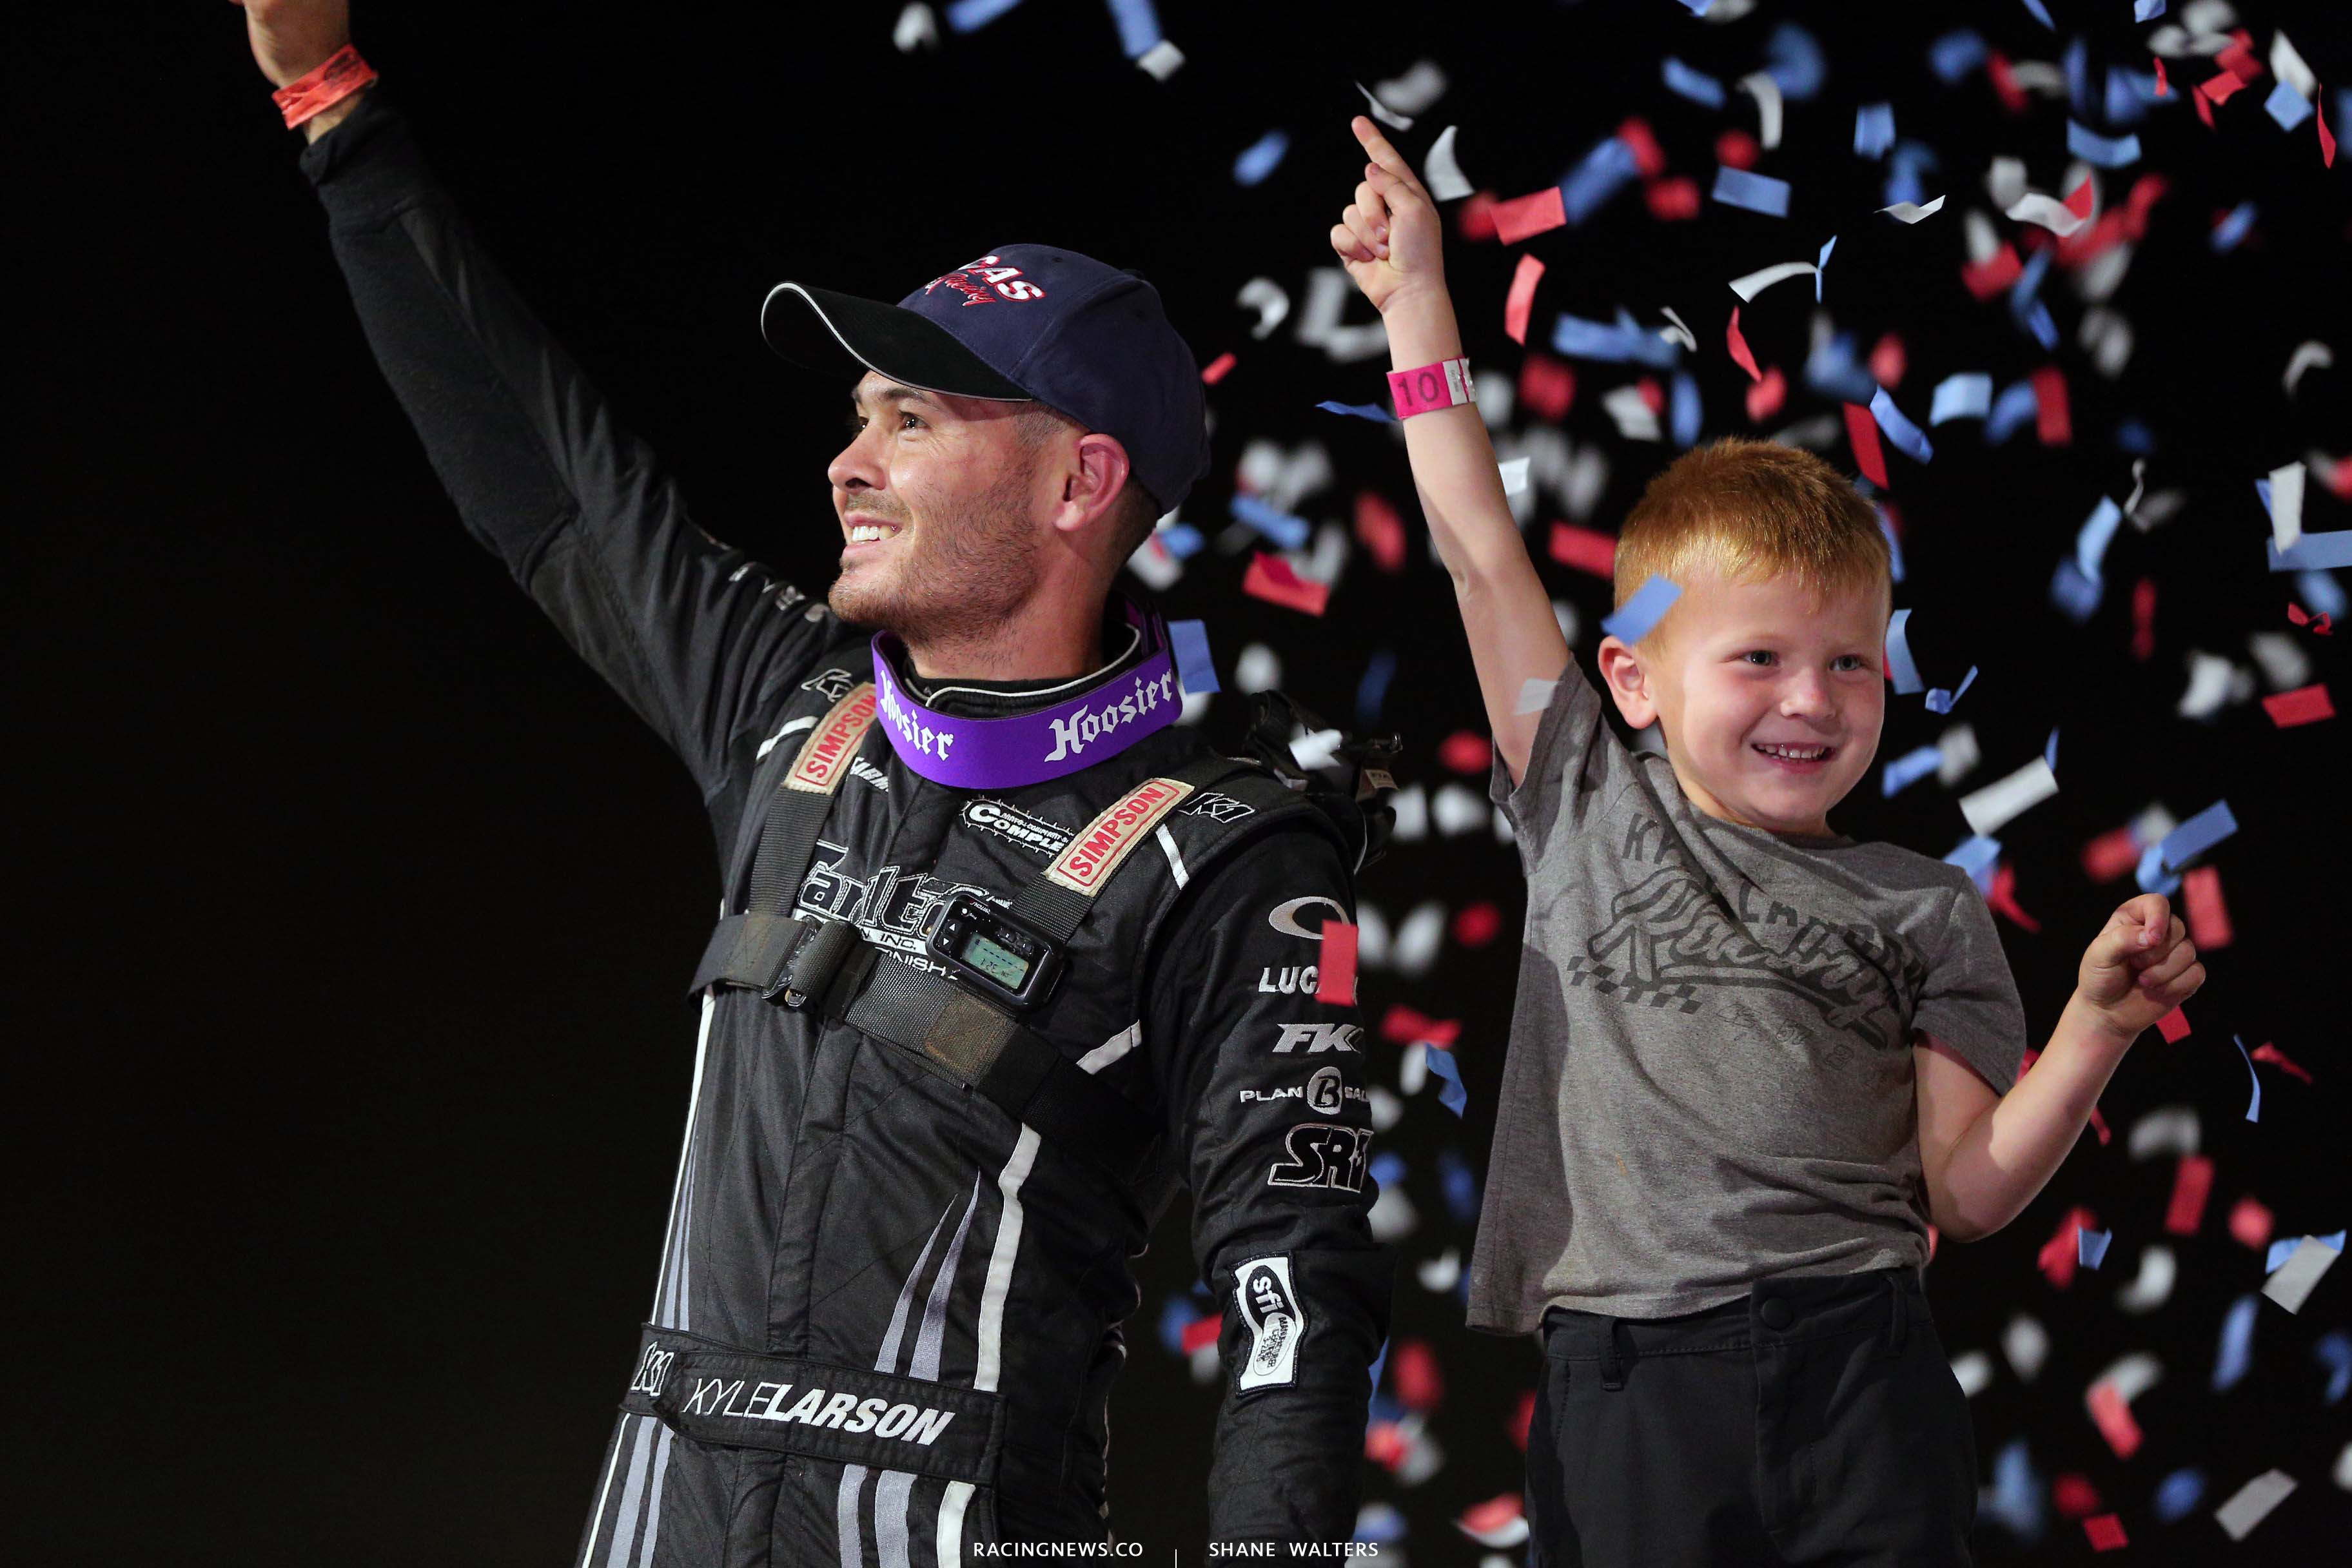 Kyle Larson and Owen Larson in victory lane at Port Royal Speedway 2990